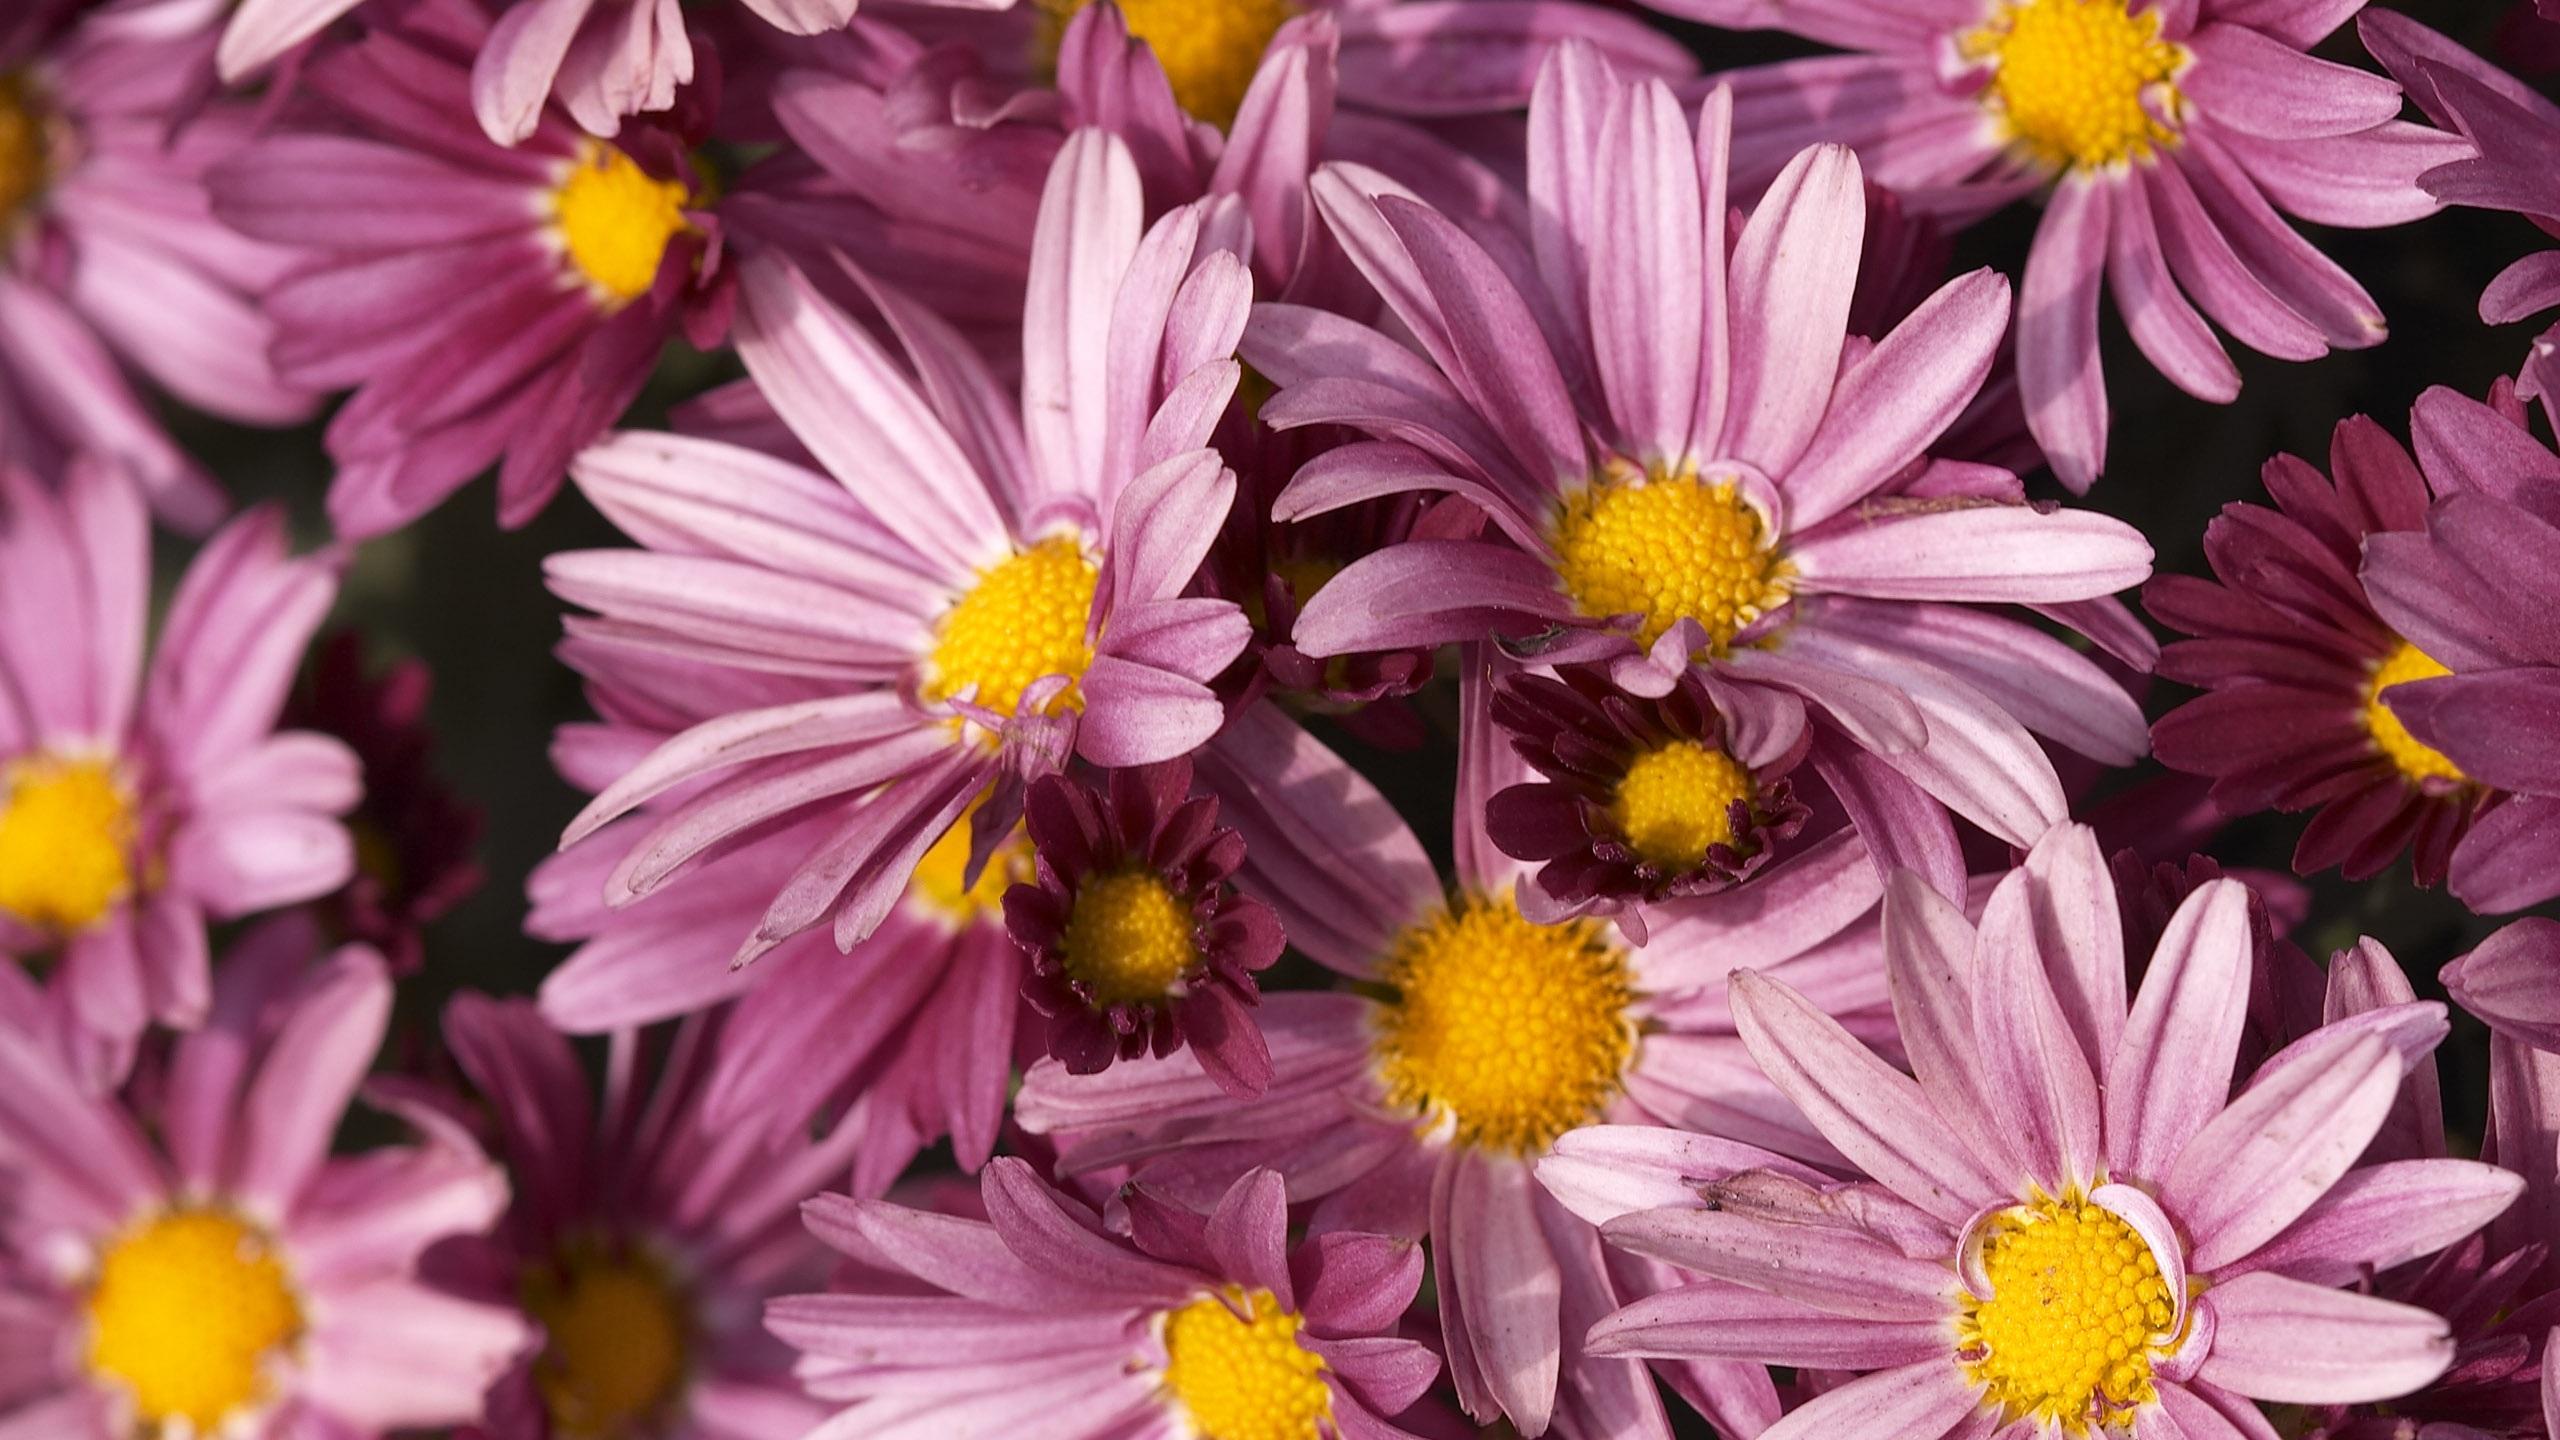 Fonds d 39 cran t l charger 2560x1440 fleurs pourpres qhd for Fond ecran qhd